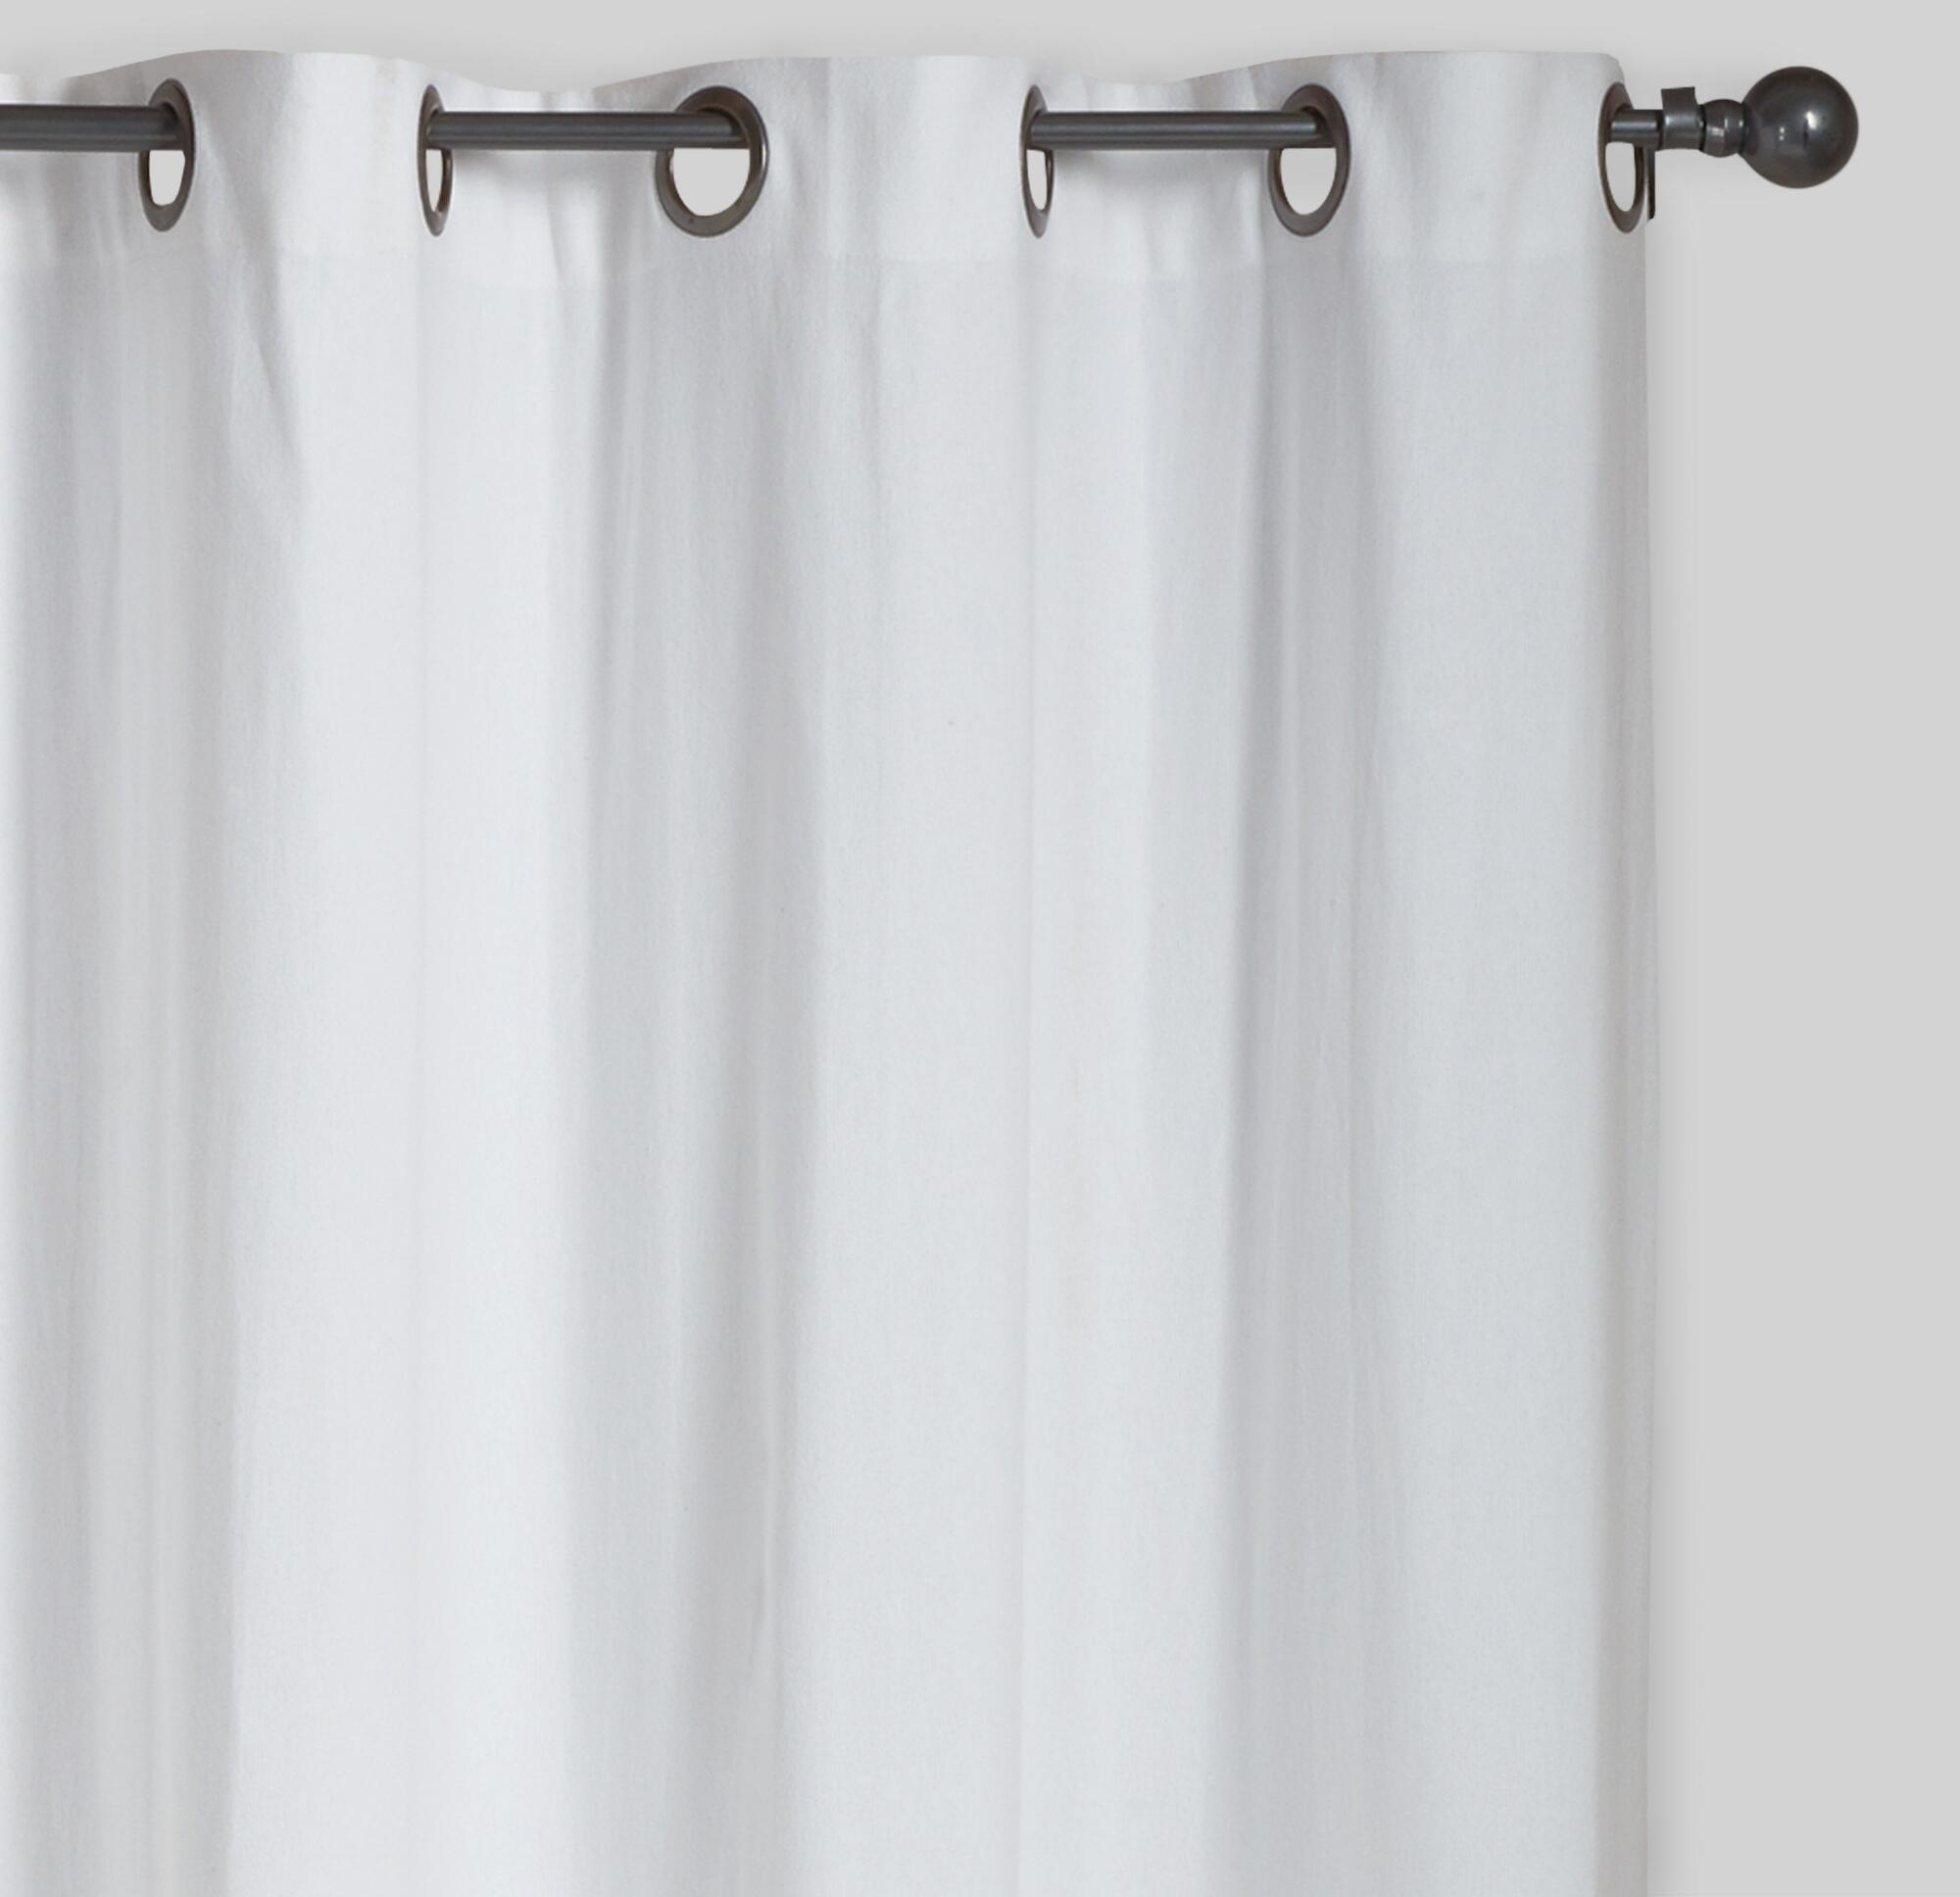 White Parker Grommet Top Curtains, Set of 2 | World Market